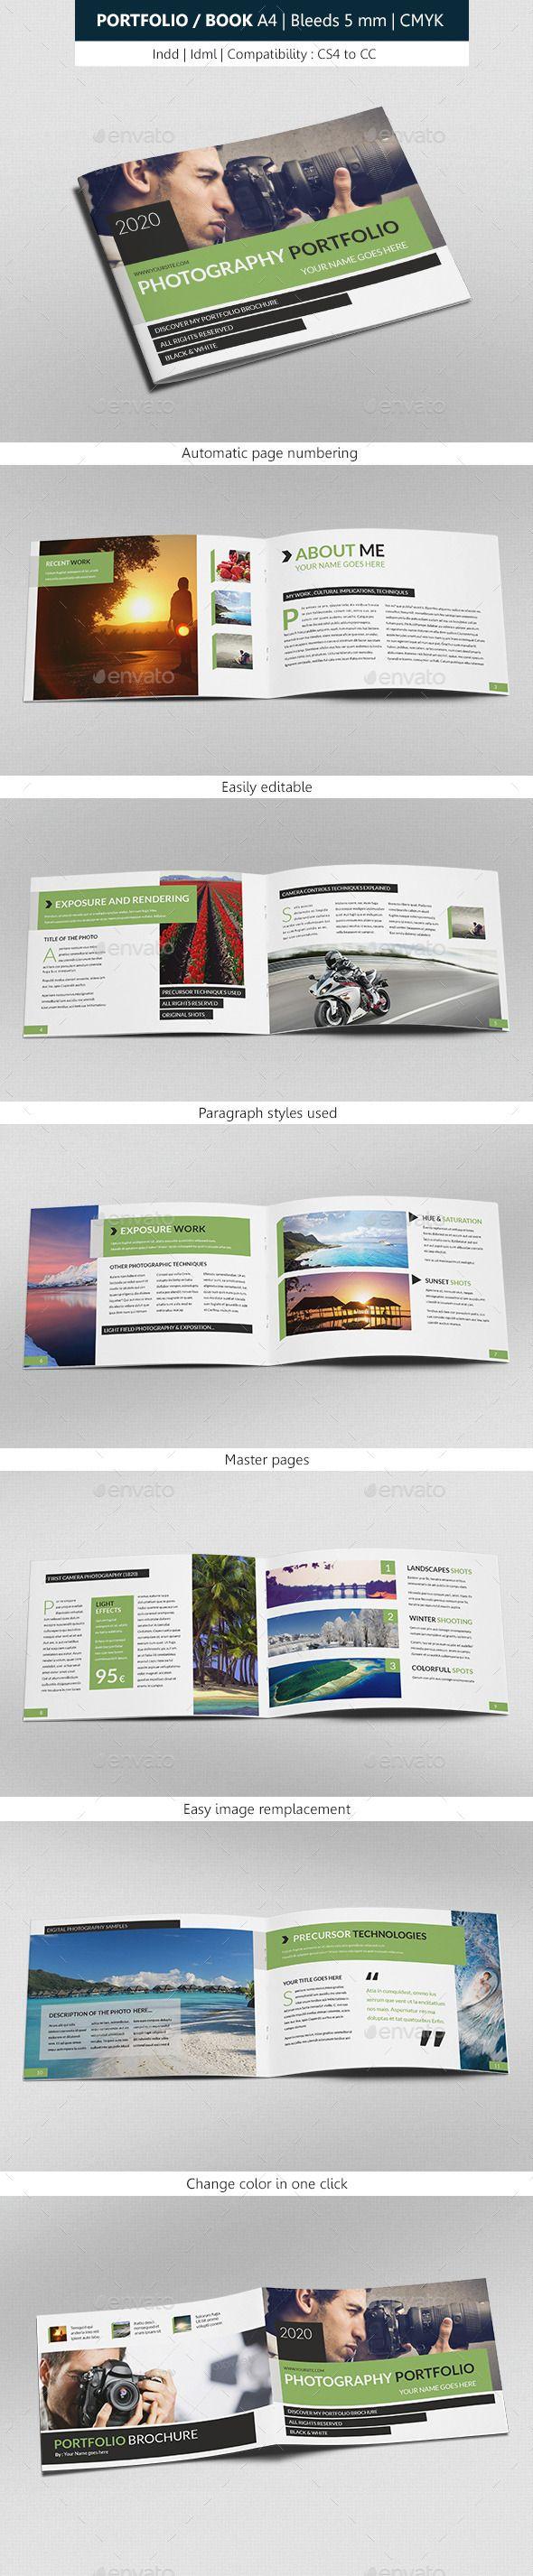 Portfolio & Book Photograph Indesign Template | Indesign templates ...